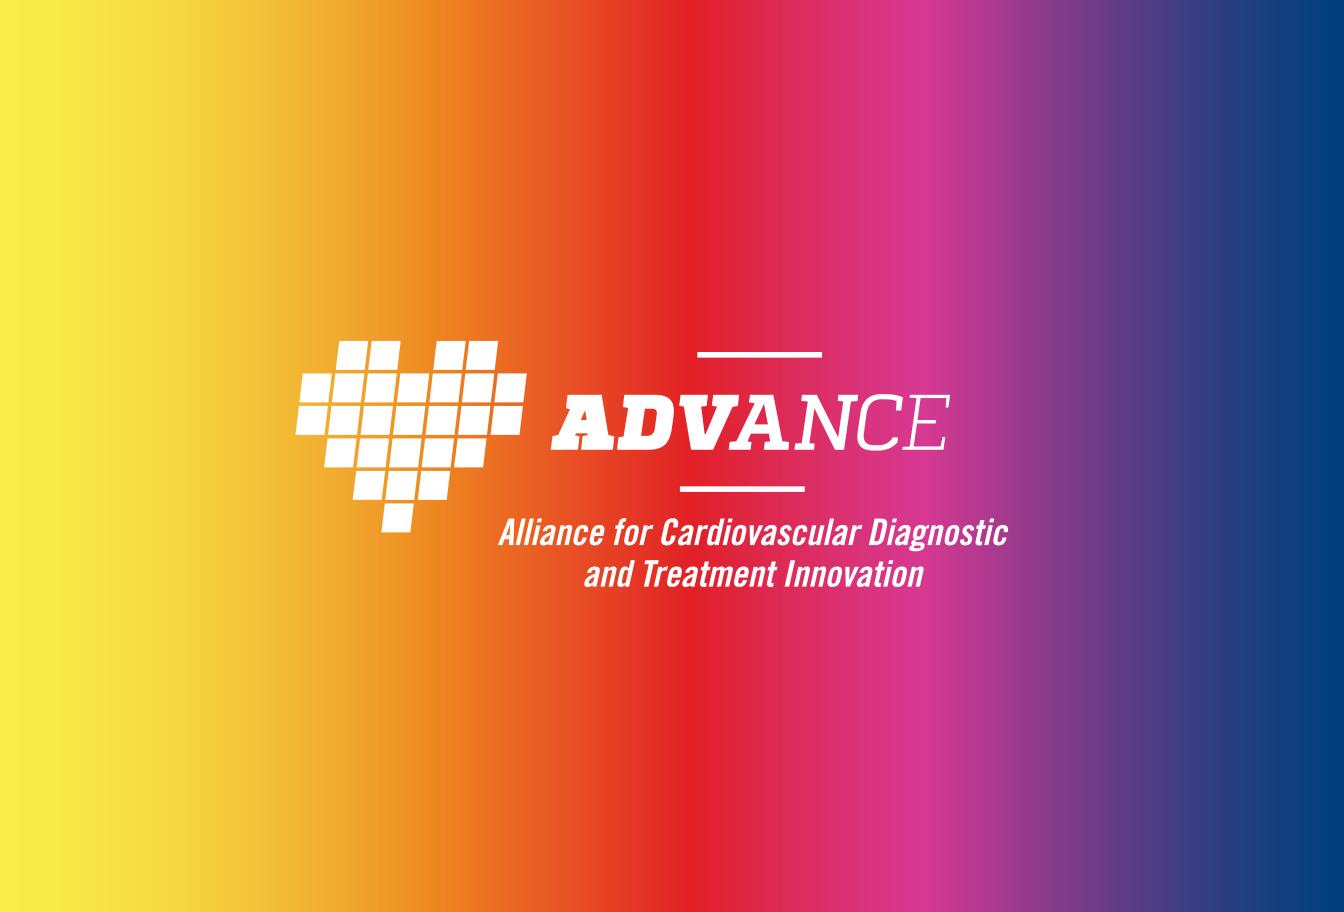 Johns-Hopkins-ADVANCE-5.jpg